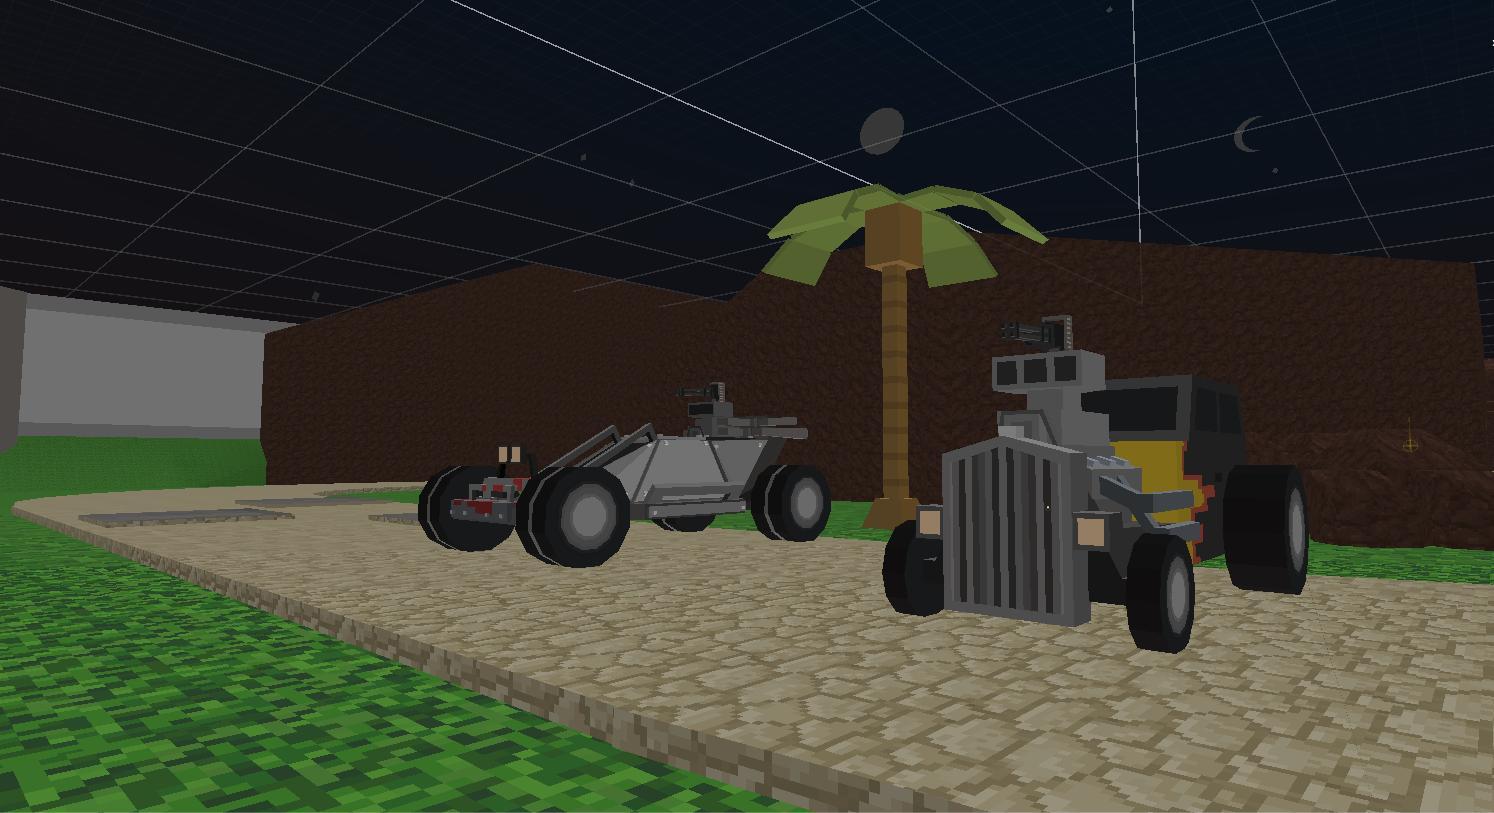 Blocky Combat Strike Zombie Survival 1.25 Screenshot 12